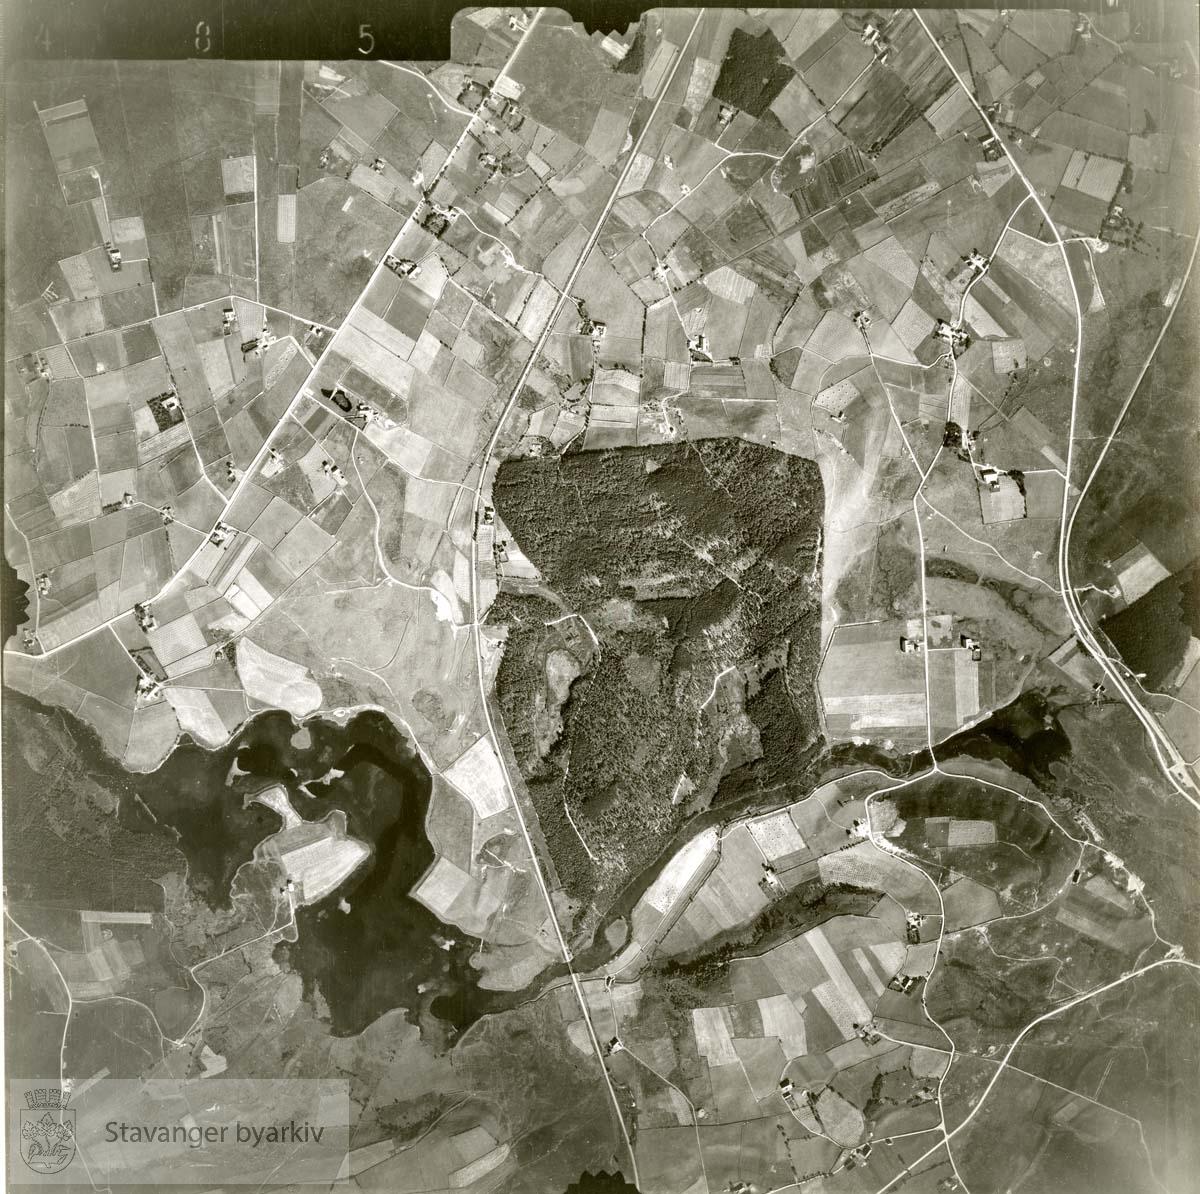 Jfr. kart/fotoplan E9/485..Skjæveland, Ganddal, Vagleskogen..Se ByStW_Uca_002 (kan lastes ned under fanen for kart på Stavangerbilder)